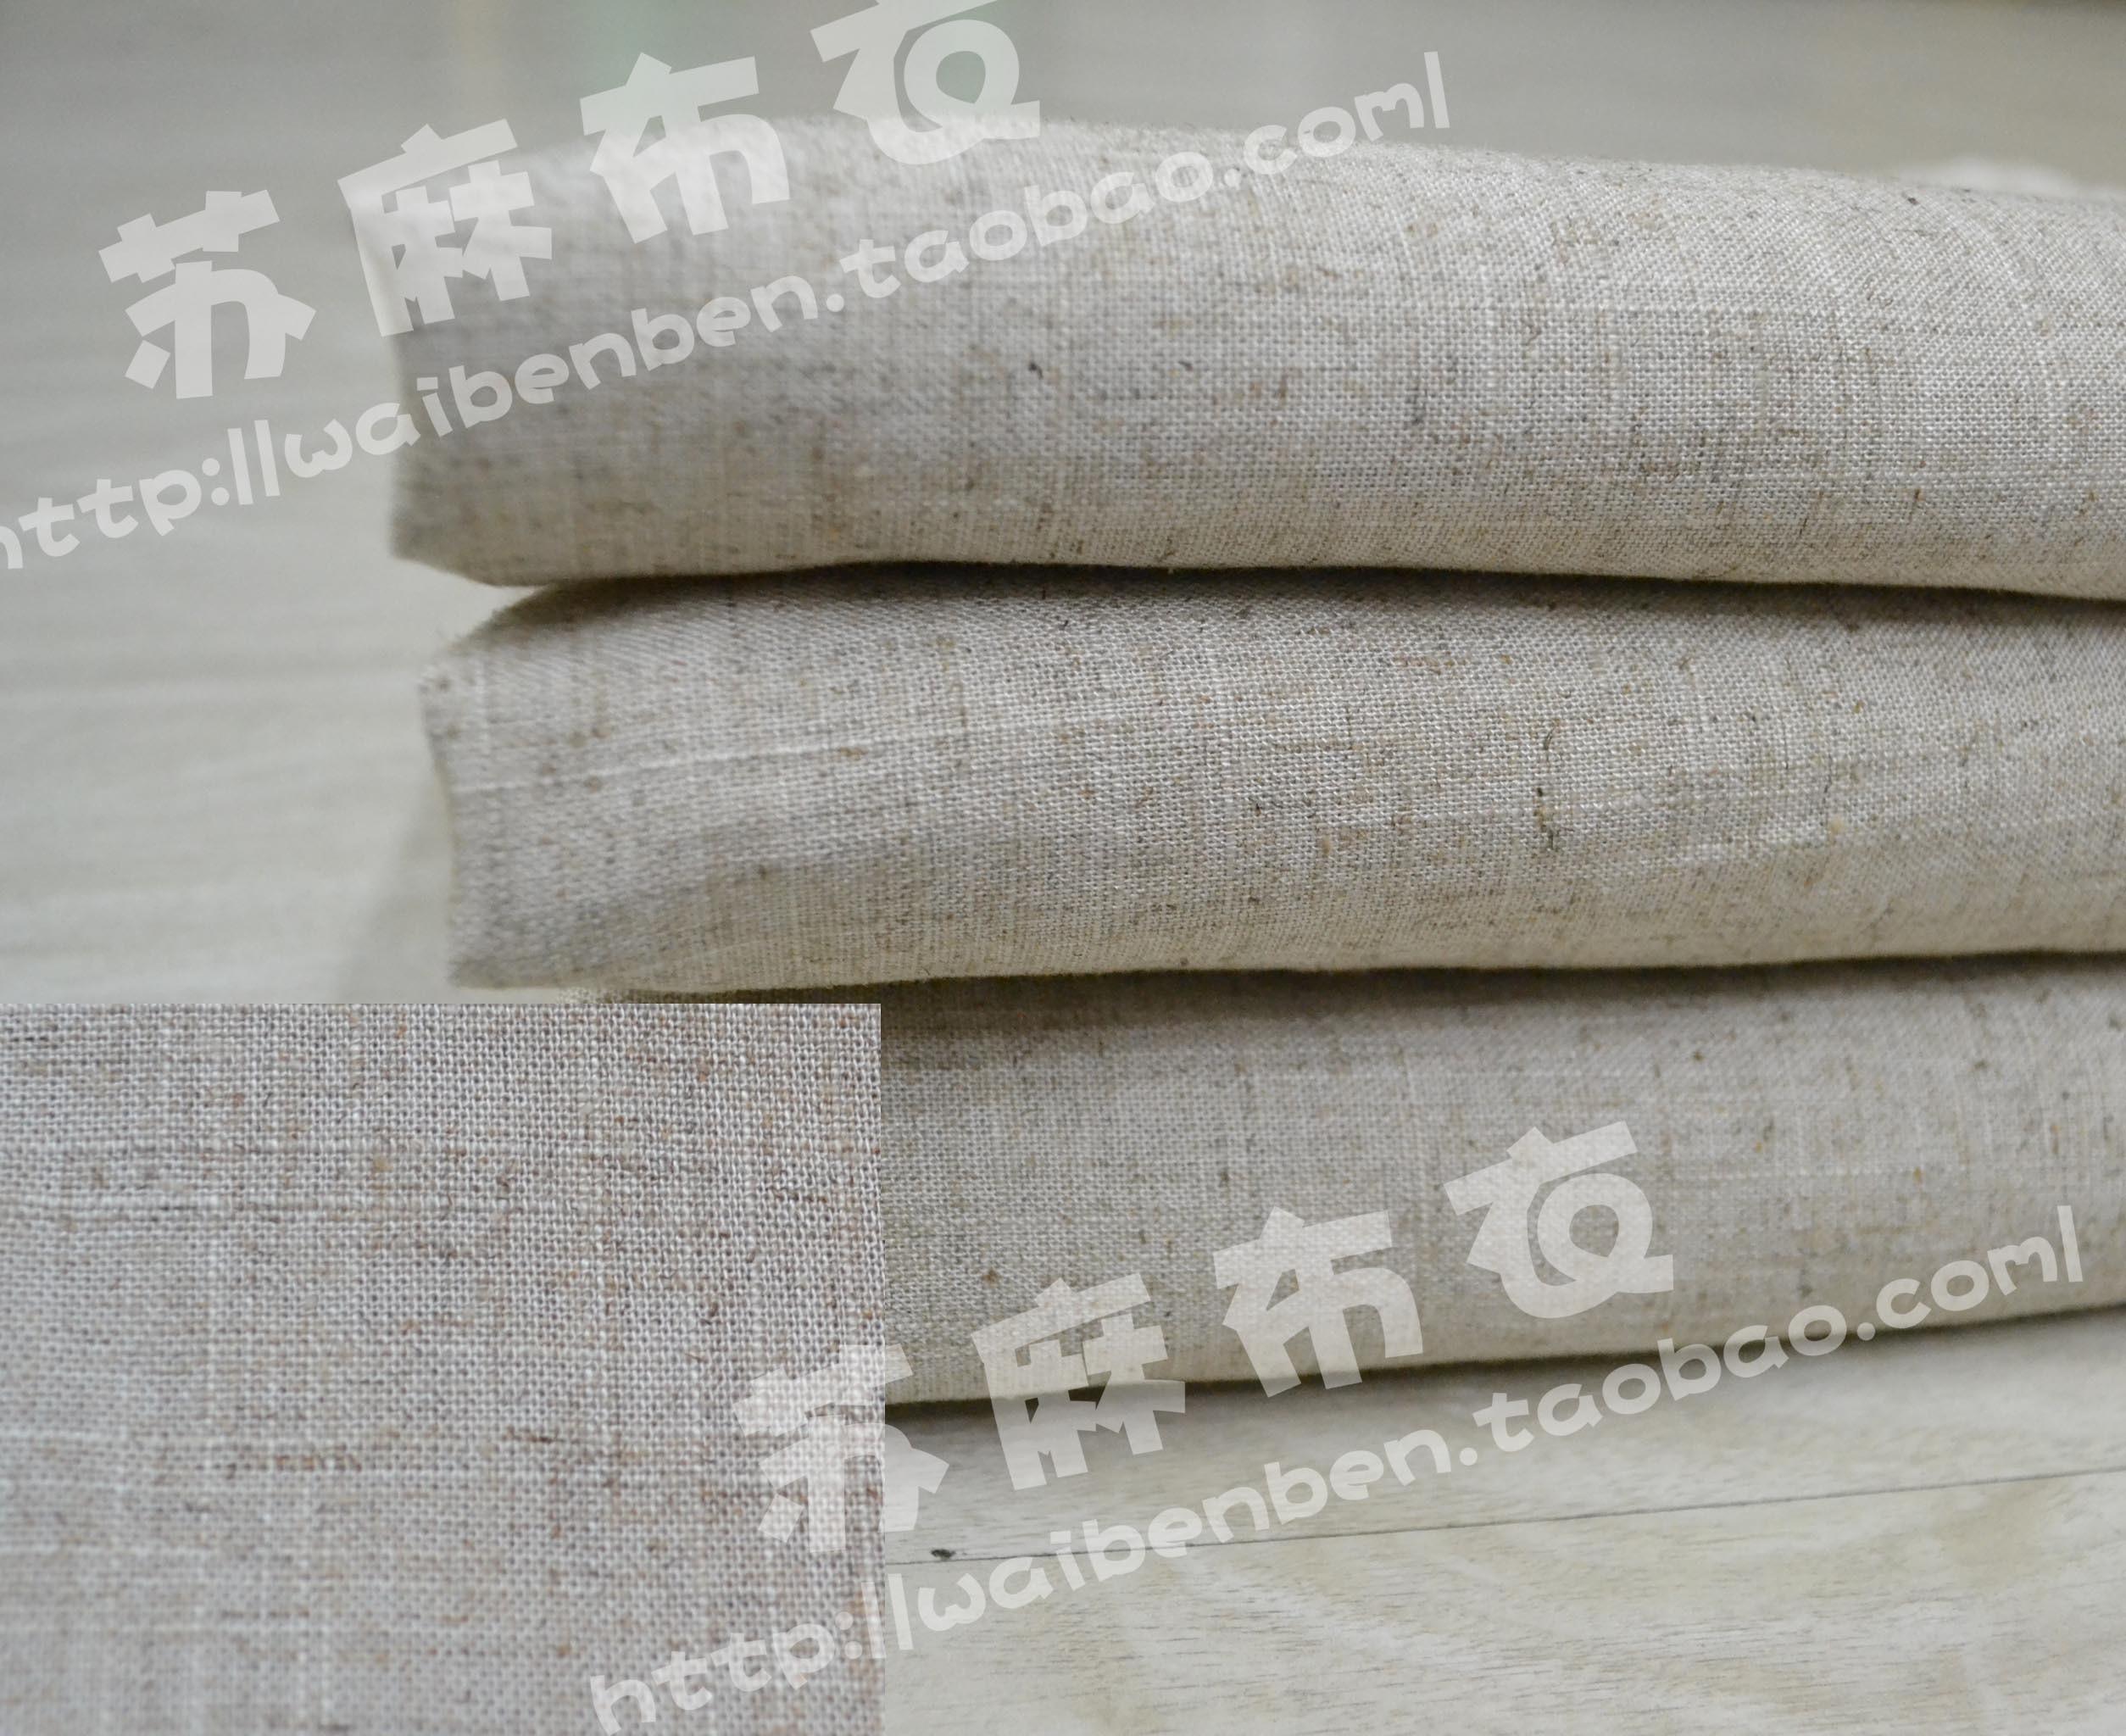 Primaries linen slub self-shade fluid cloth sofa decoration 2004 diy clothes table cloth(China (Mainland))